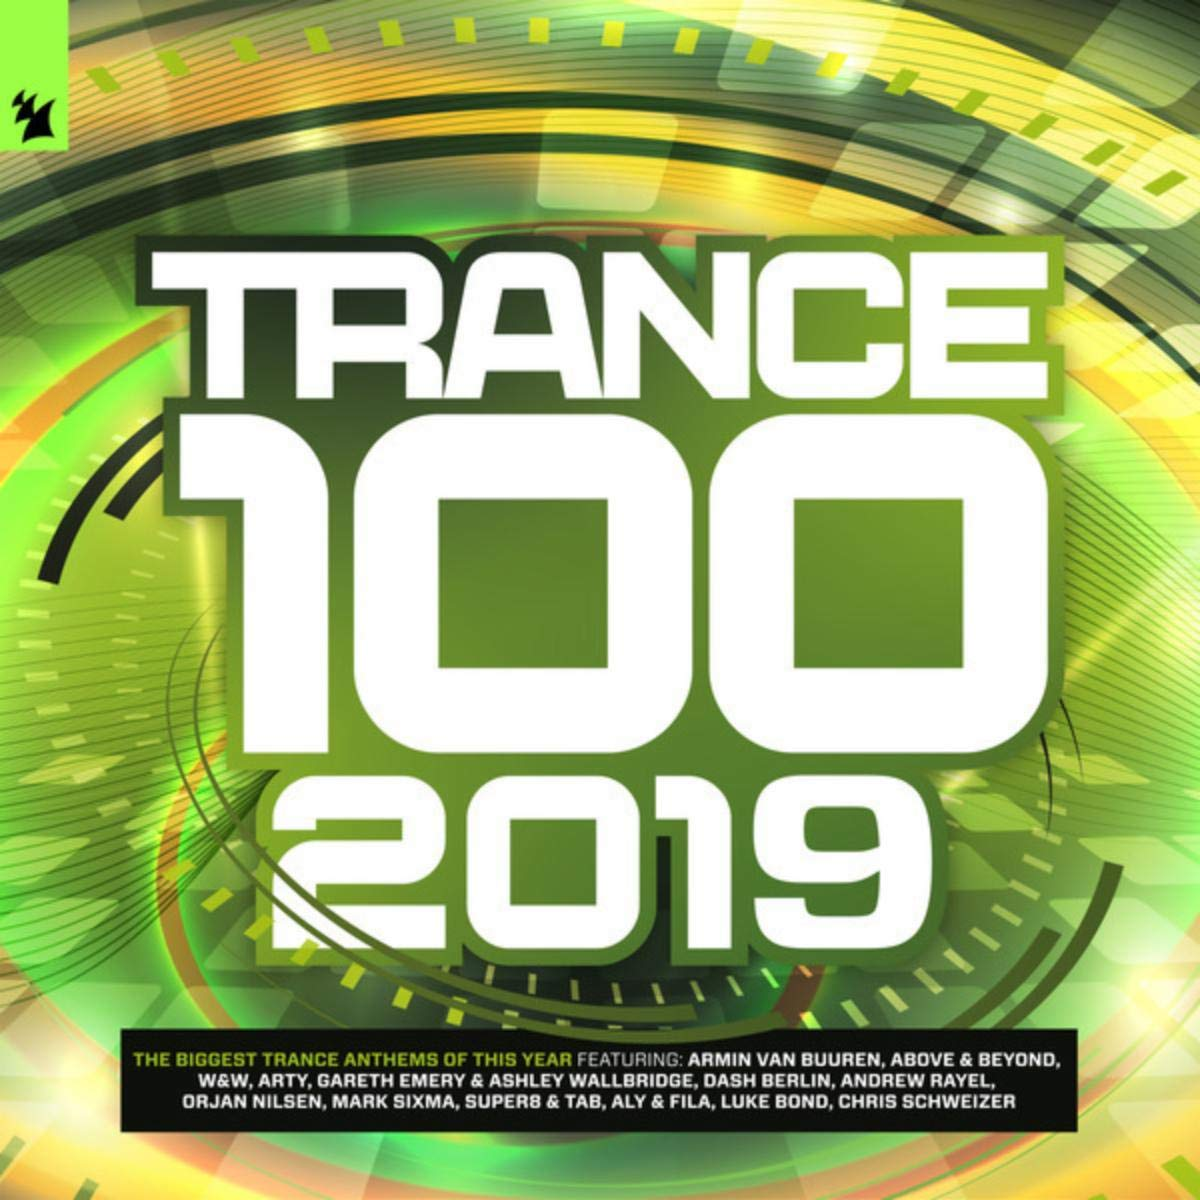 VA – Trance 100 2019 (2019) [FLAC]